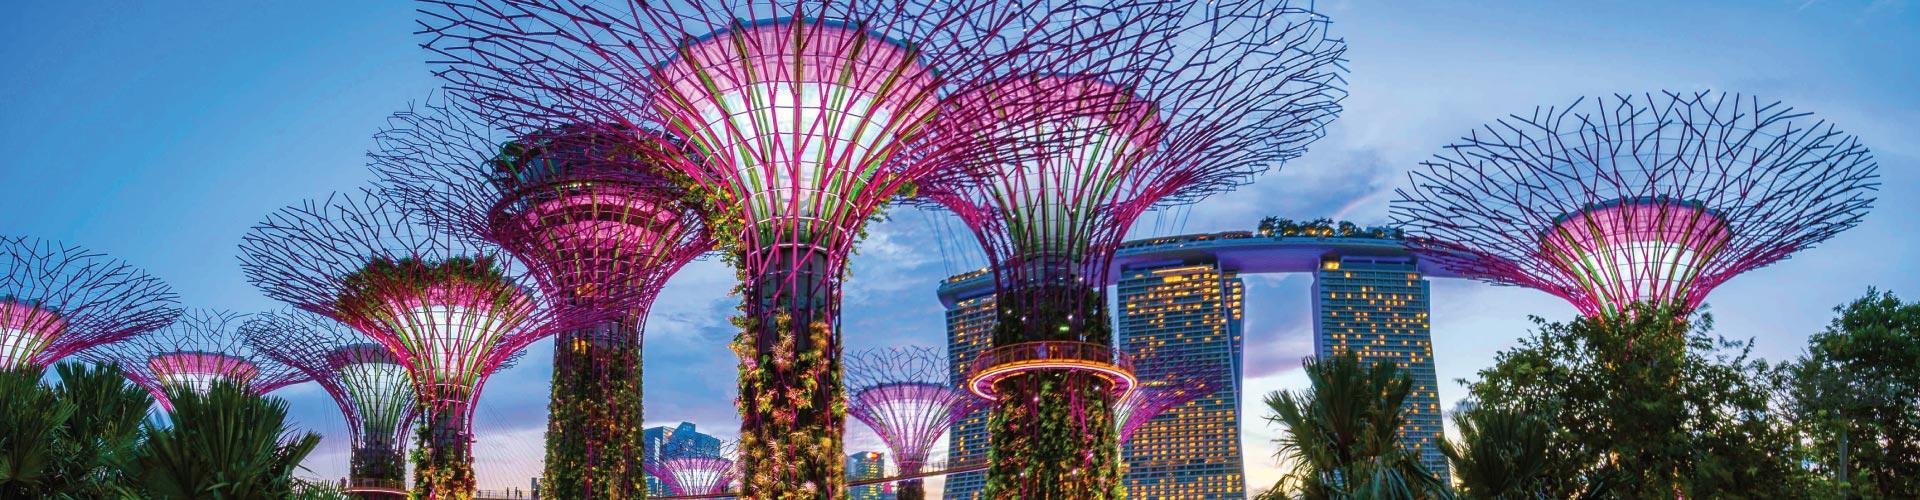 Singapore - Laem Chabang (Costa Cruise)